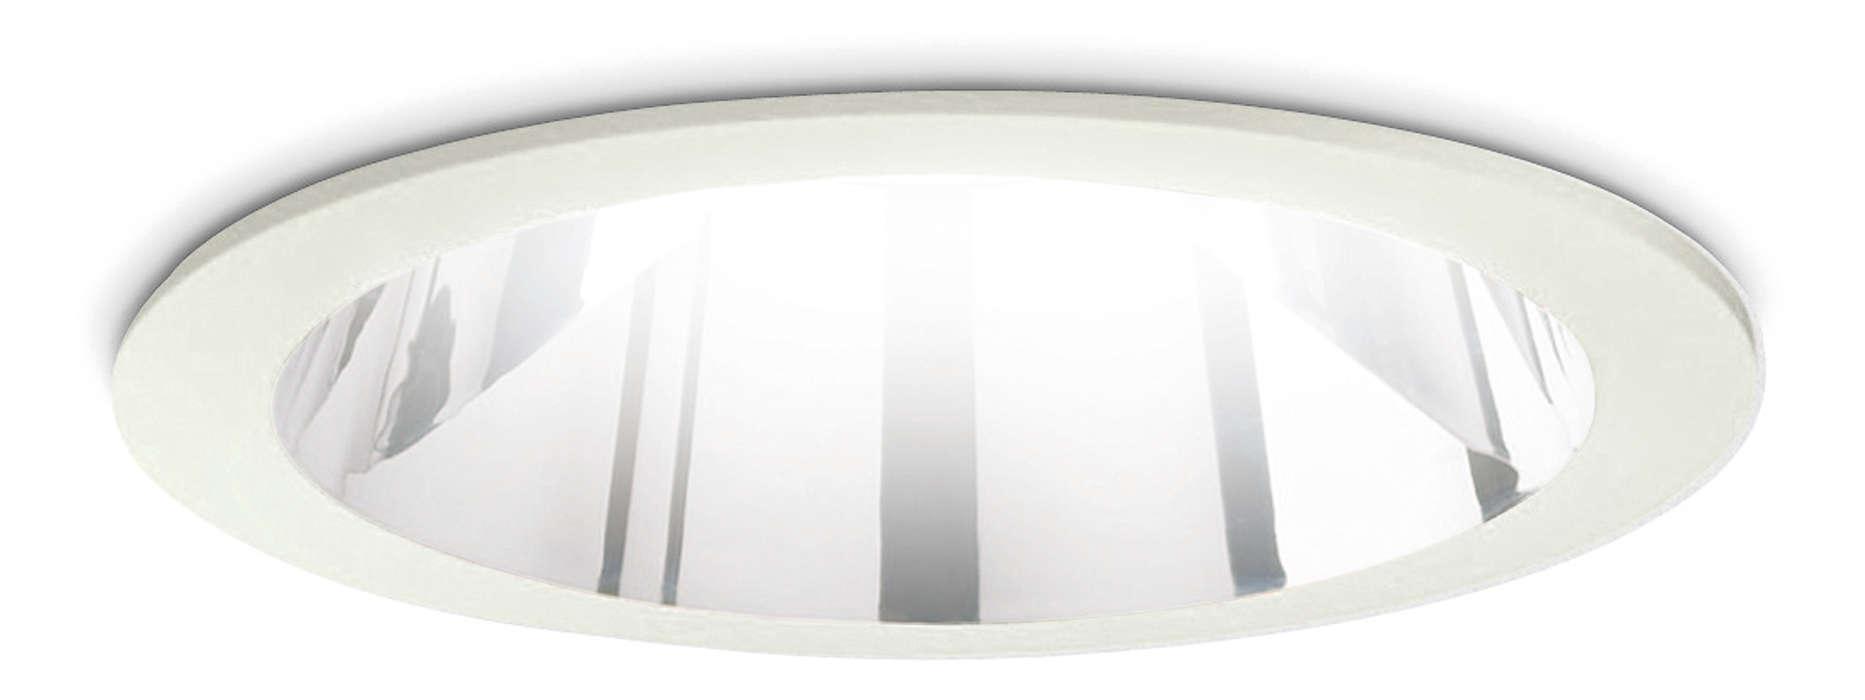 Fugato Power, general lighting